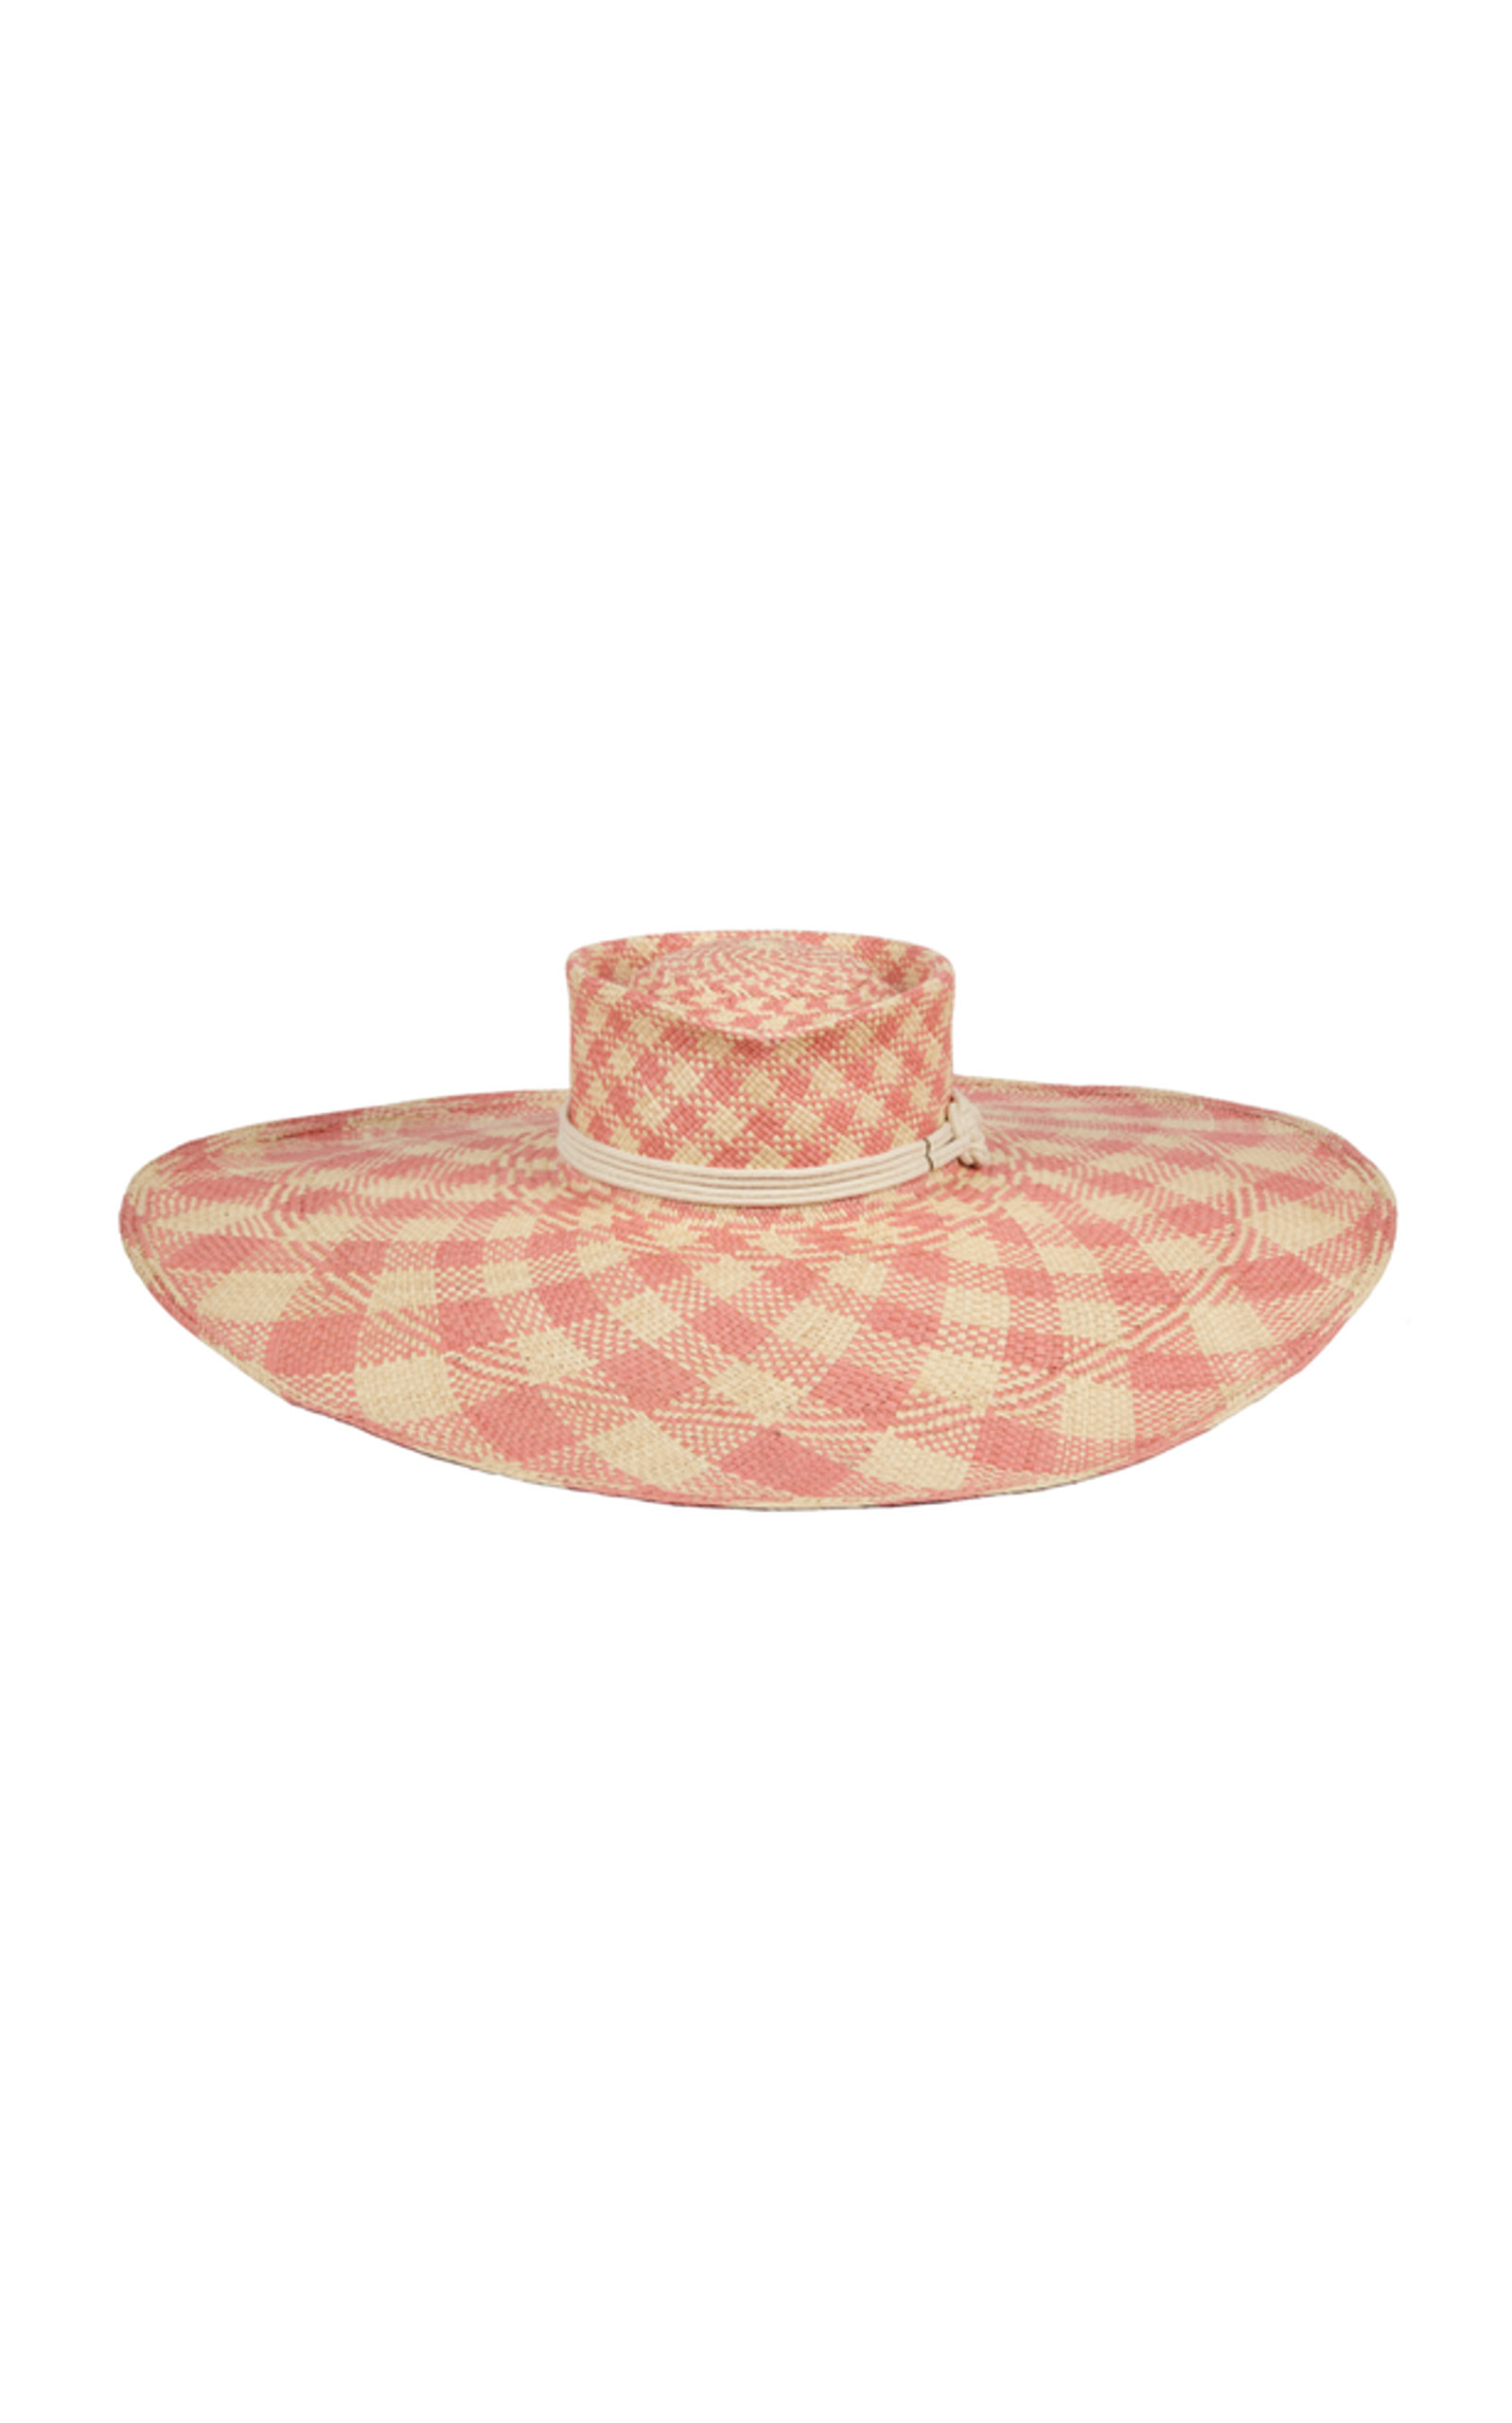 Monroe Hat Gladys Tamez Millinery Free Shipping Websites hnypdDR